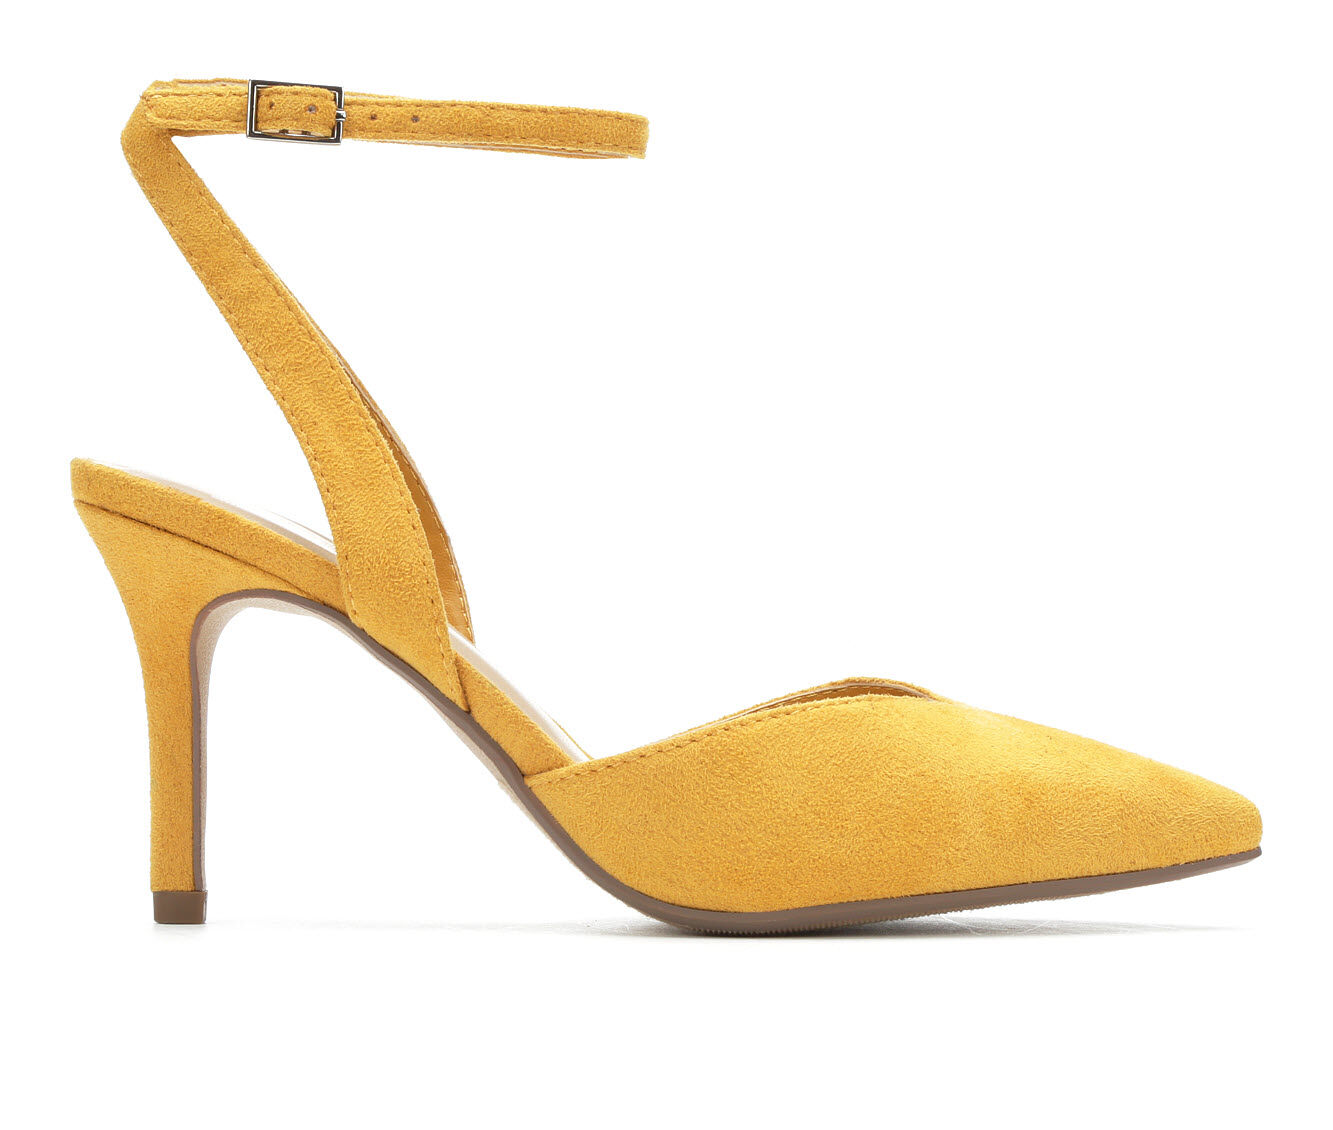 uk shoes_kd6188